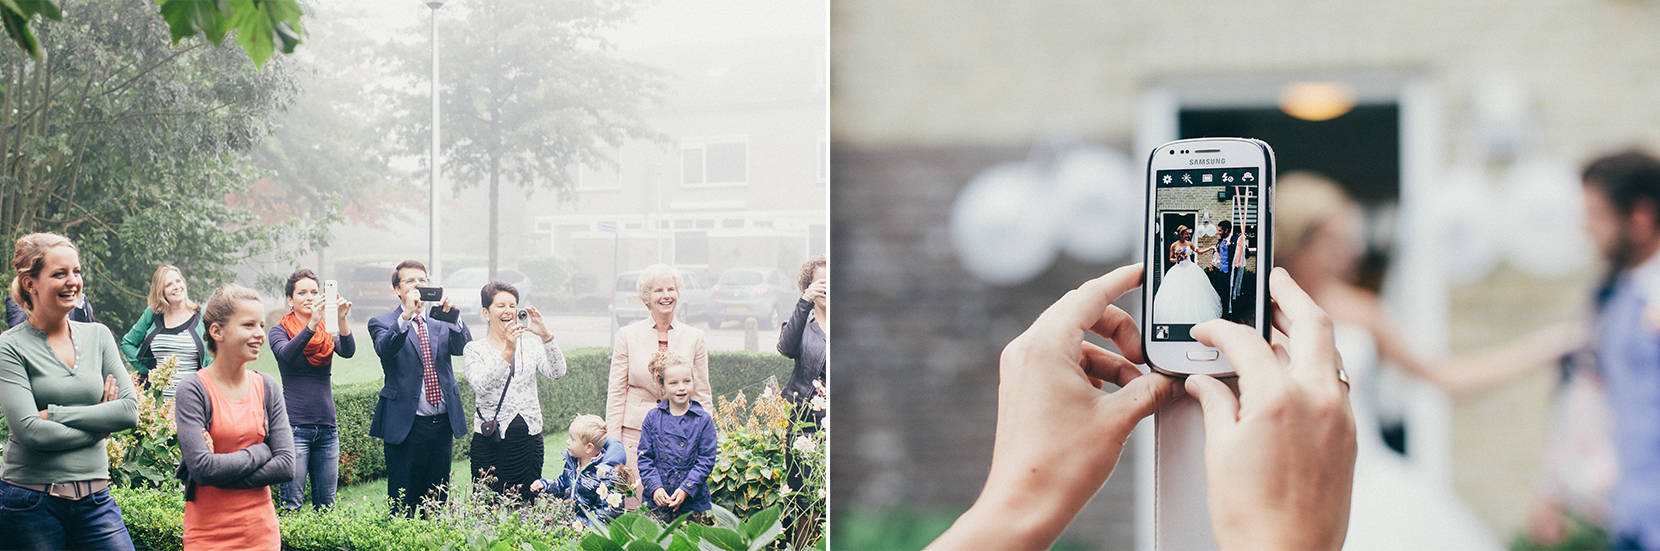 Bruidsfotografie_Rotterdam_Rogier_Martine-6